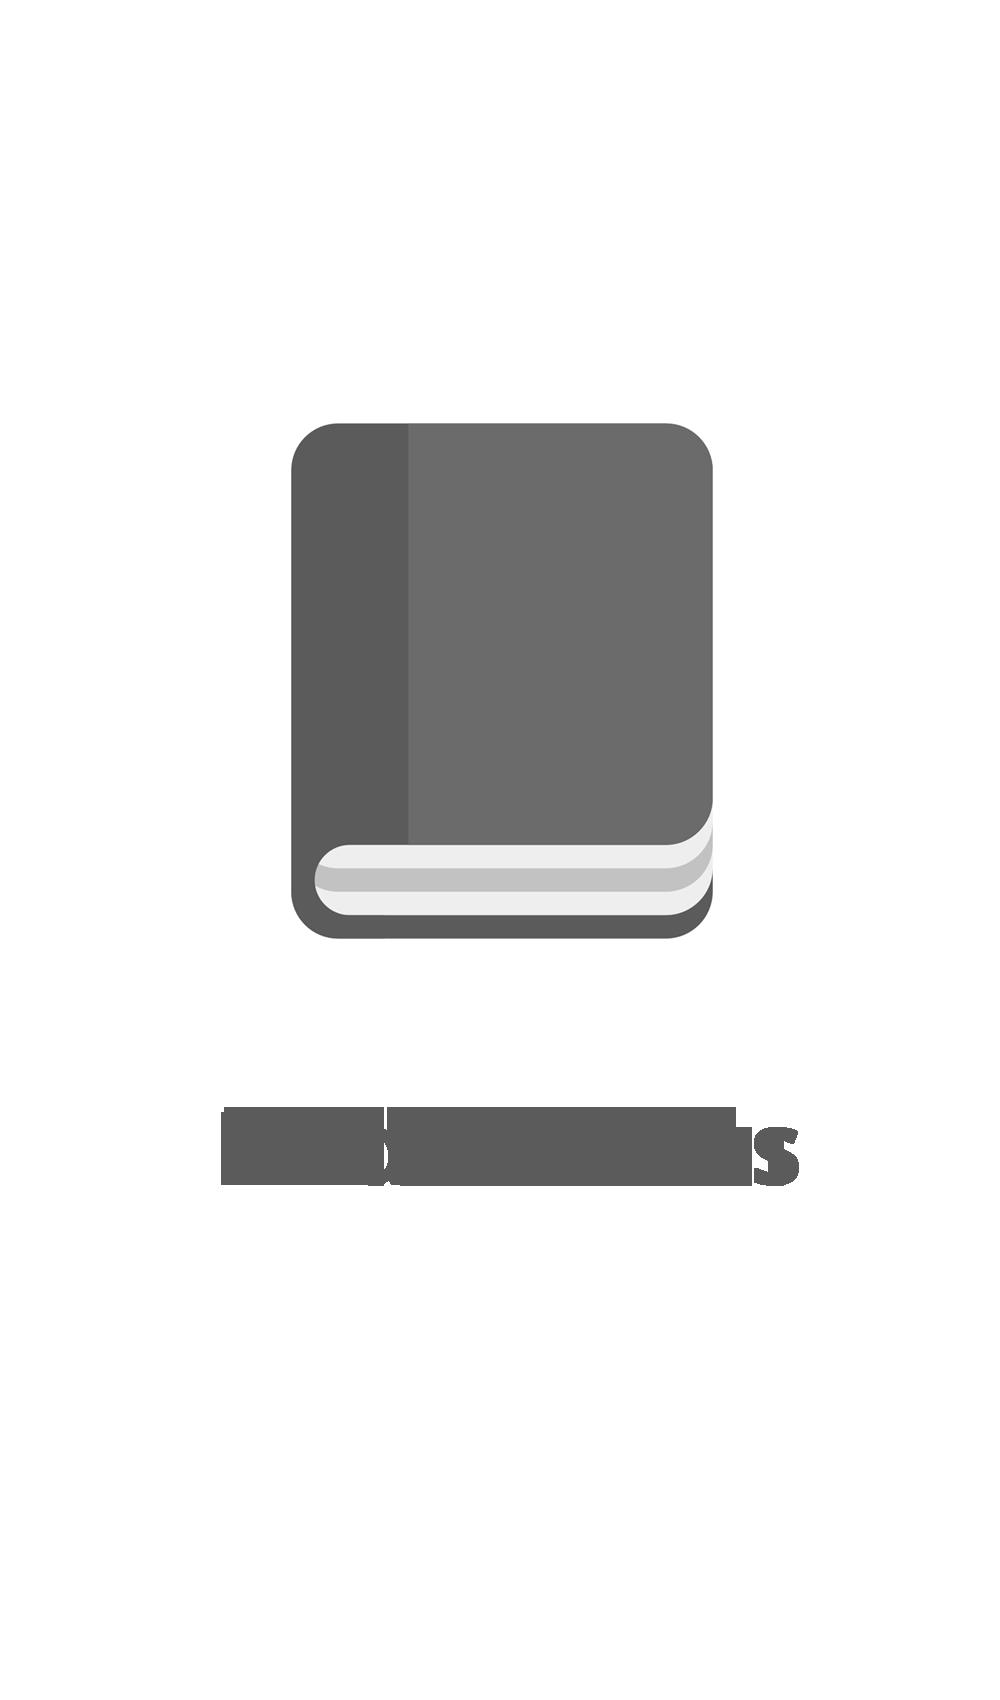 Springboard Introduction, Kassettband